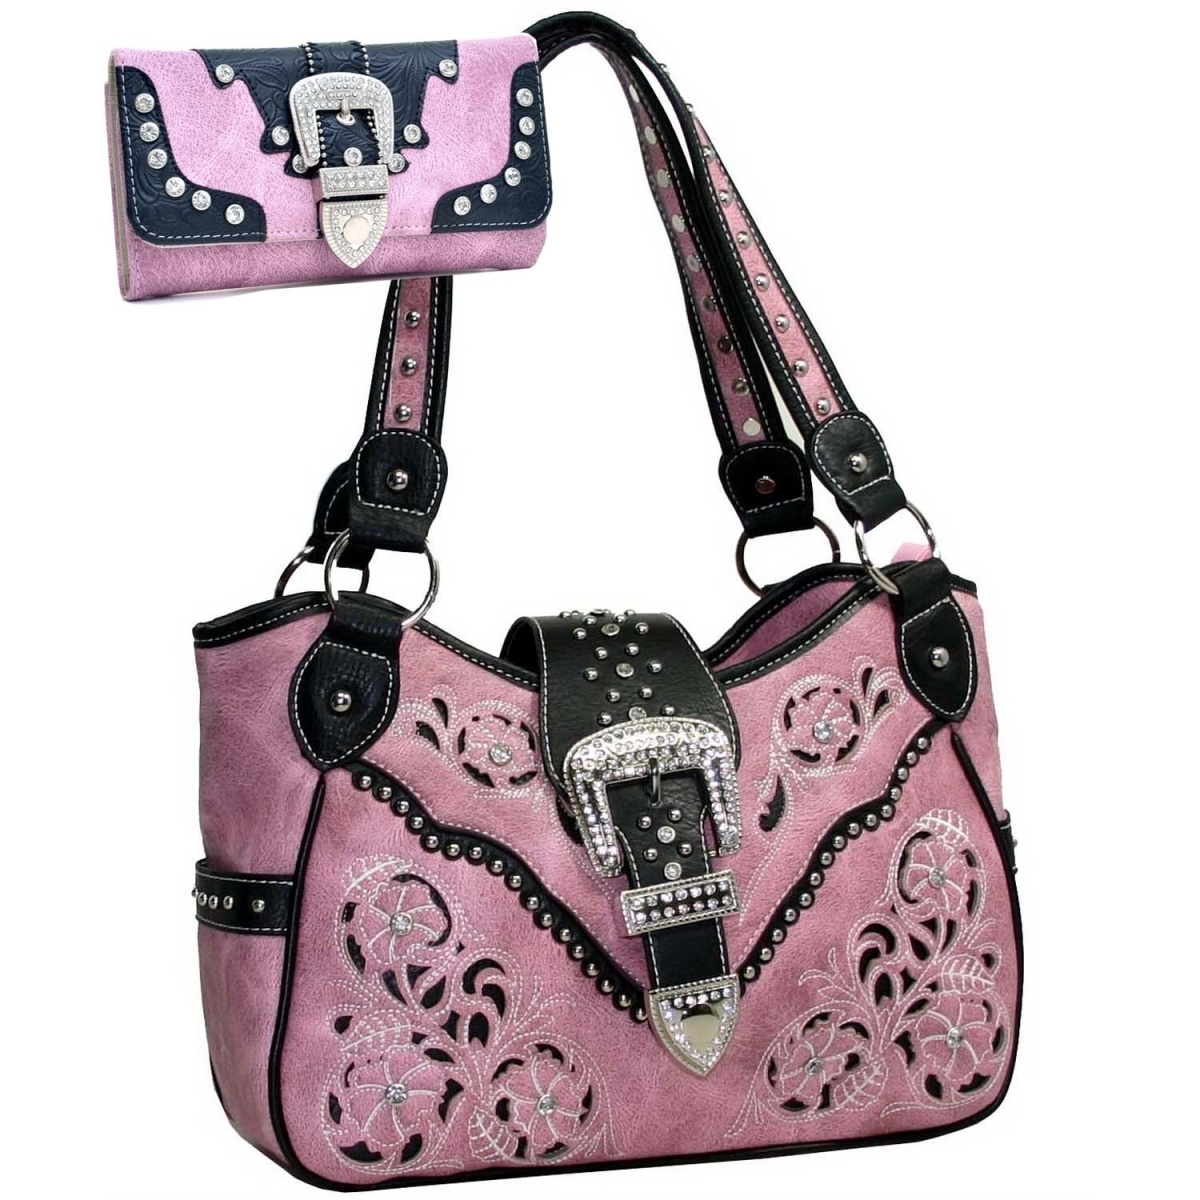 Gold Rush BT155SET-PK Western Faux Leather Belt Buckle Rhinestone Accent Purse Wallet Set - Pink все цены